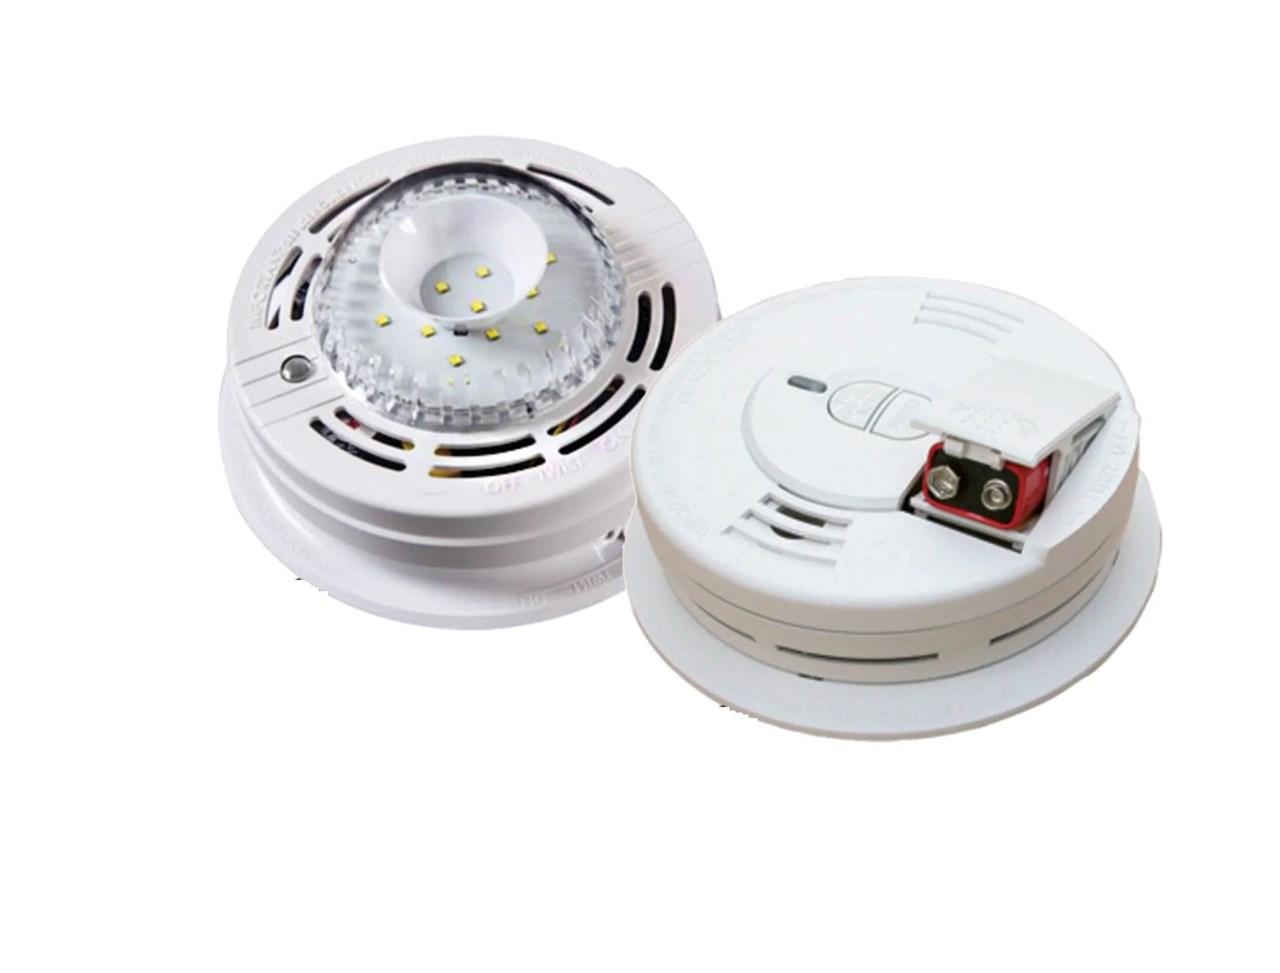 Kidde 10LLCO Carbon Monoxide Detector /& 10Y29 Optical Smoke Alarm Special Offer